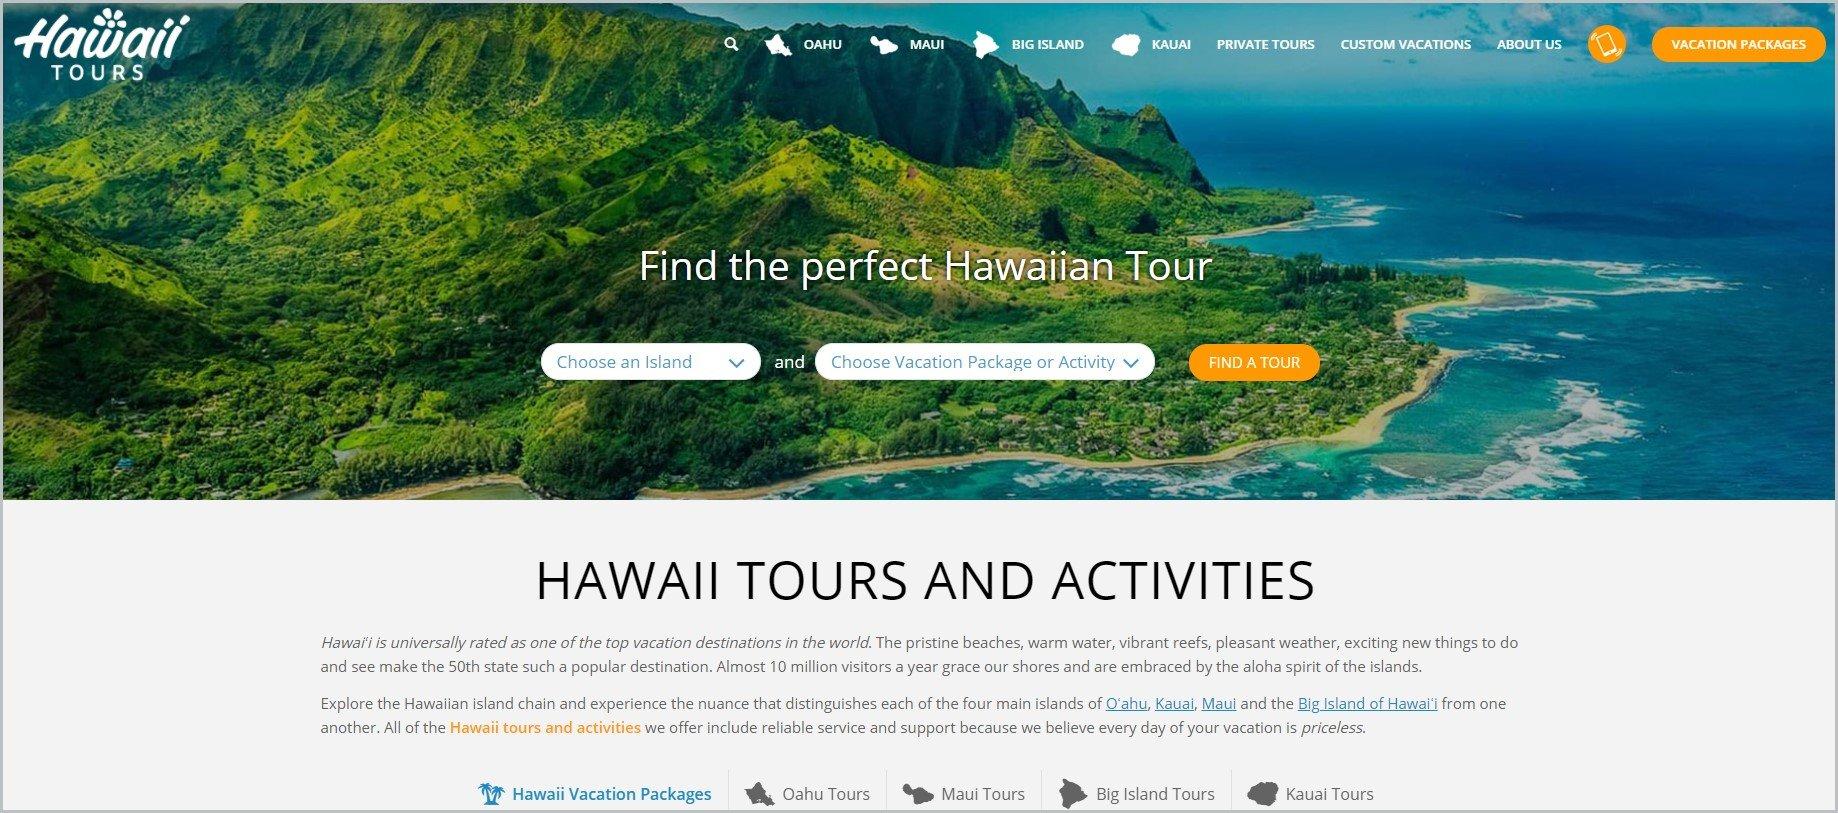 screenshot of Hawaii Tours homepage, with the aerial view of Hawaiian islands